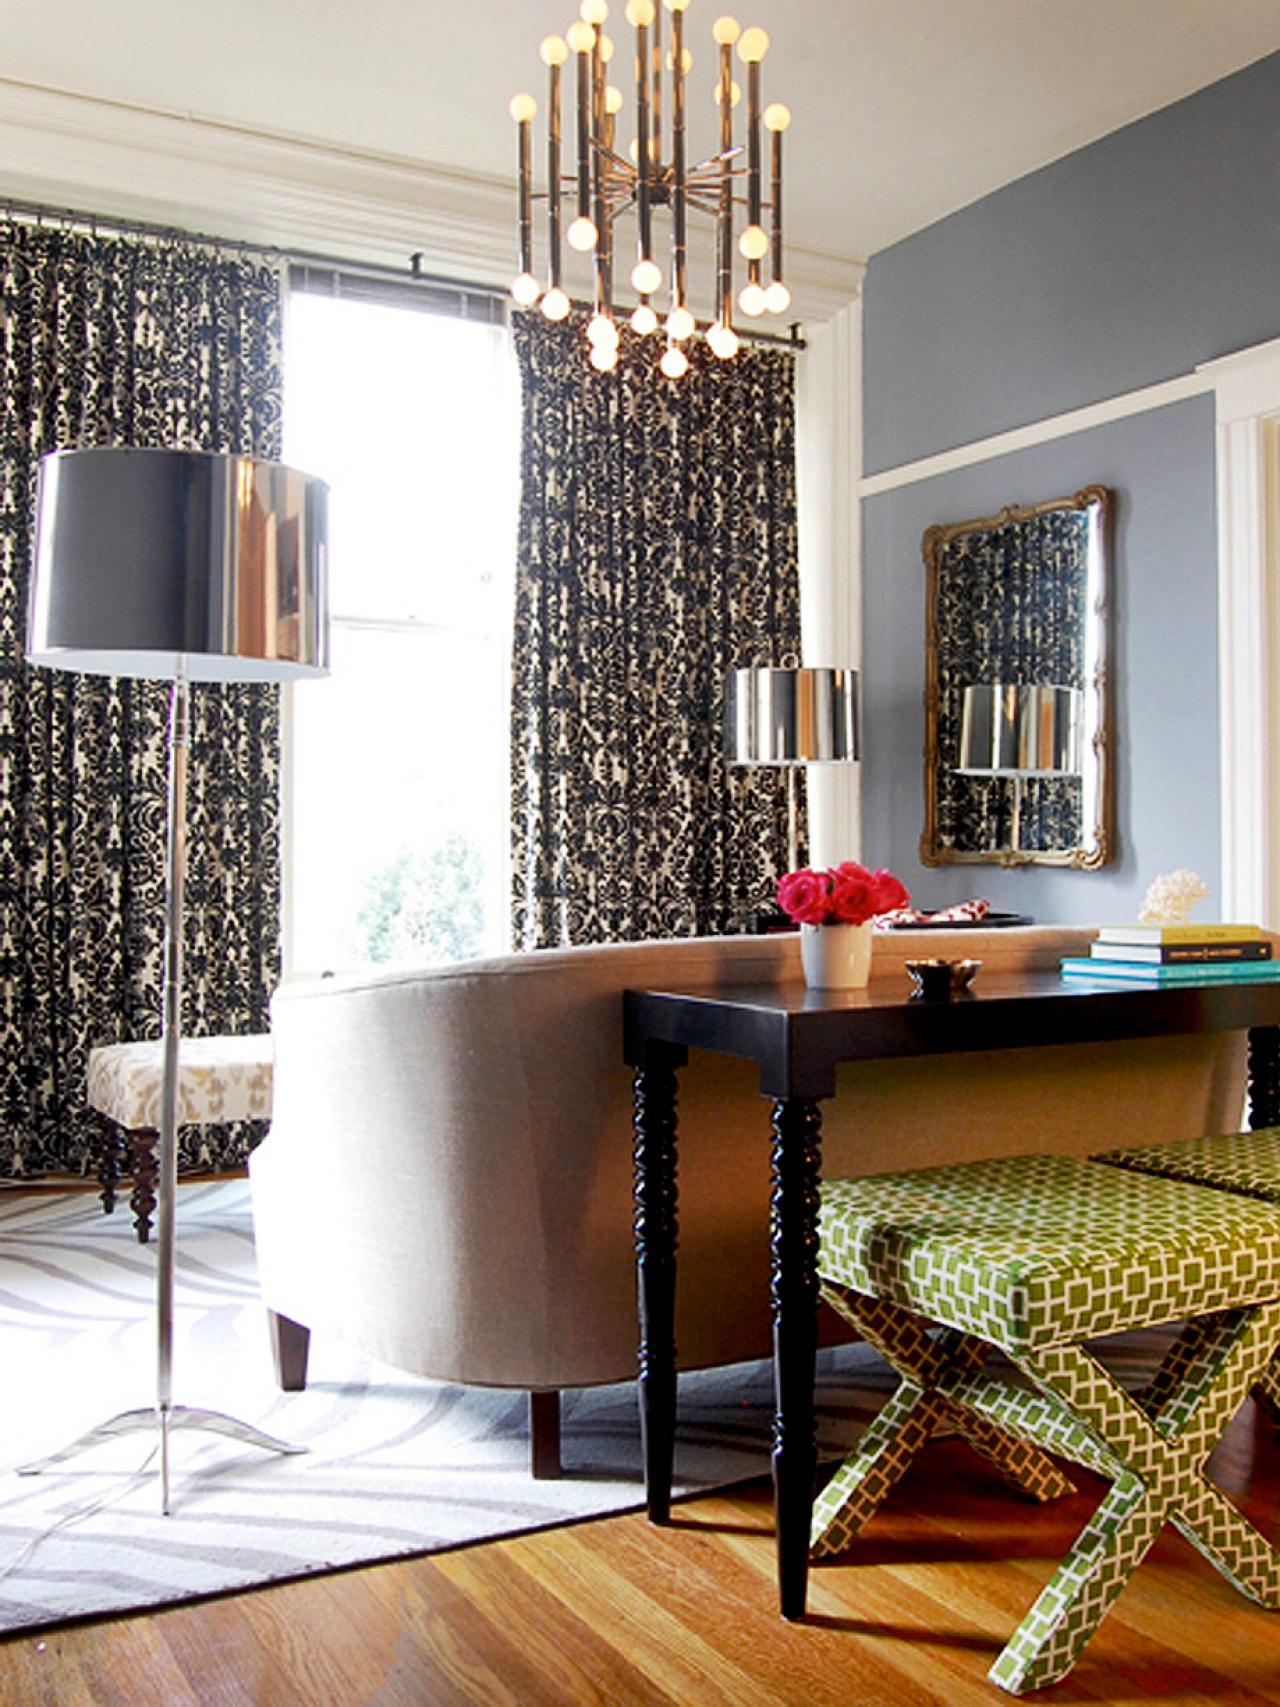 Mod Living Room Home Decor Ideas: Photo Page